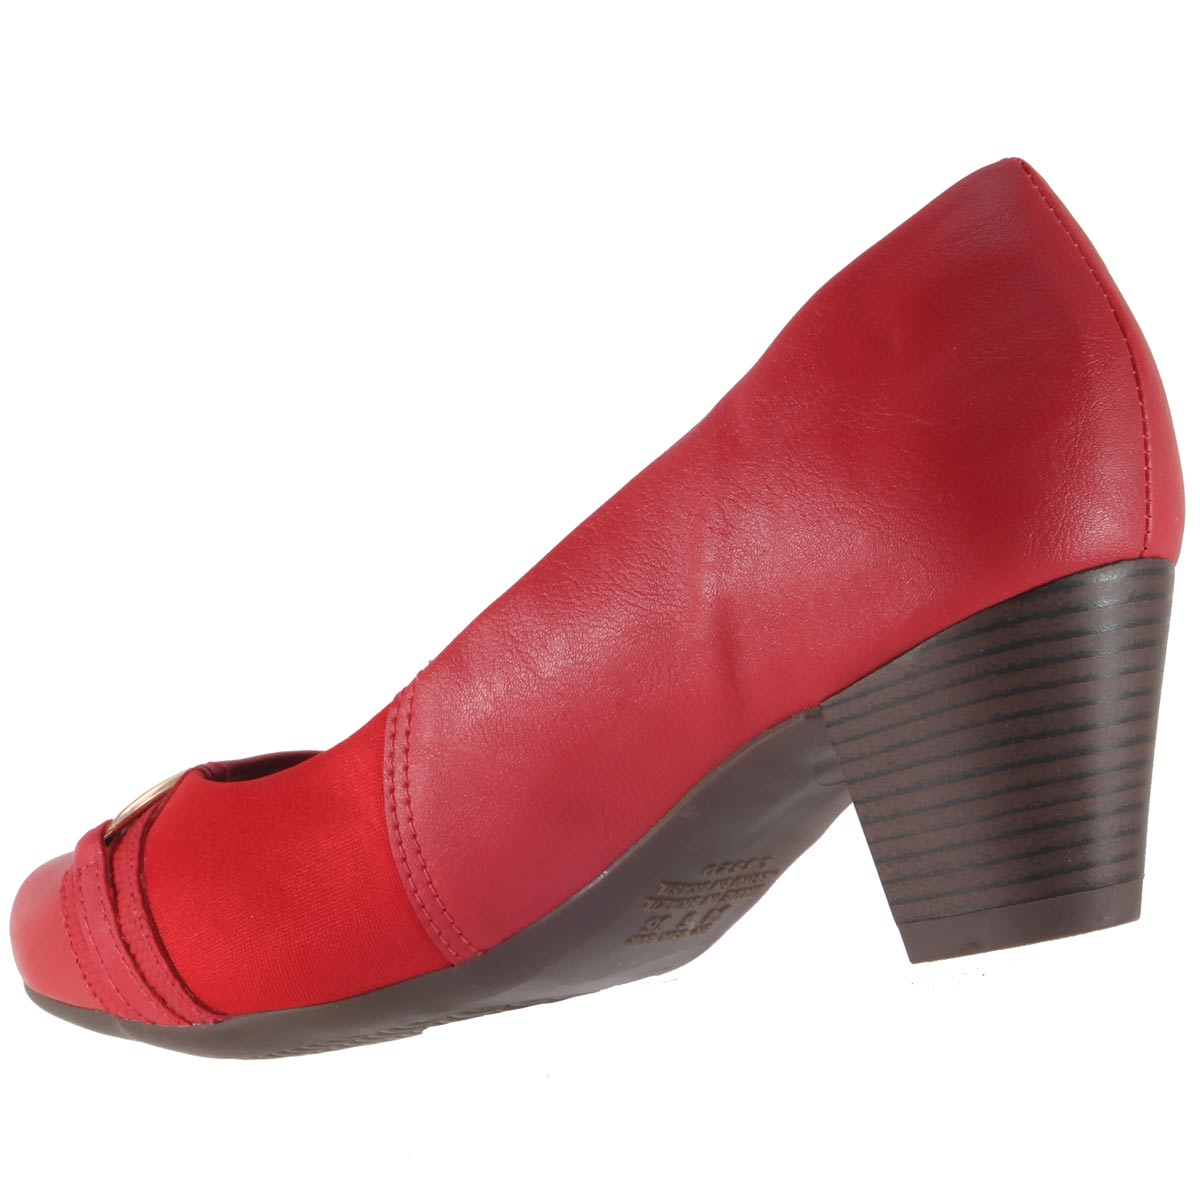 Sapato Scarpin Campesí Salto Baixo Fivela Joanete L5371